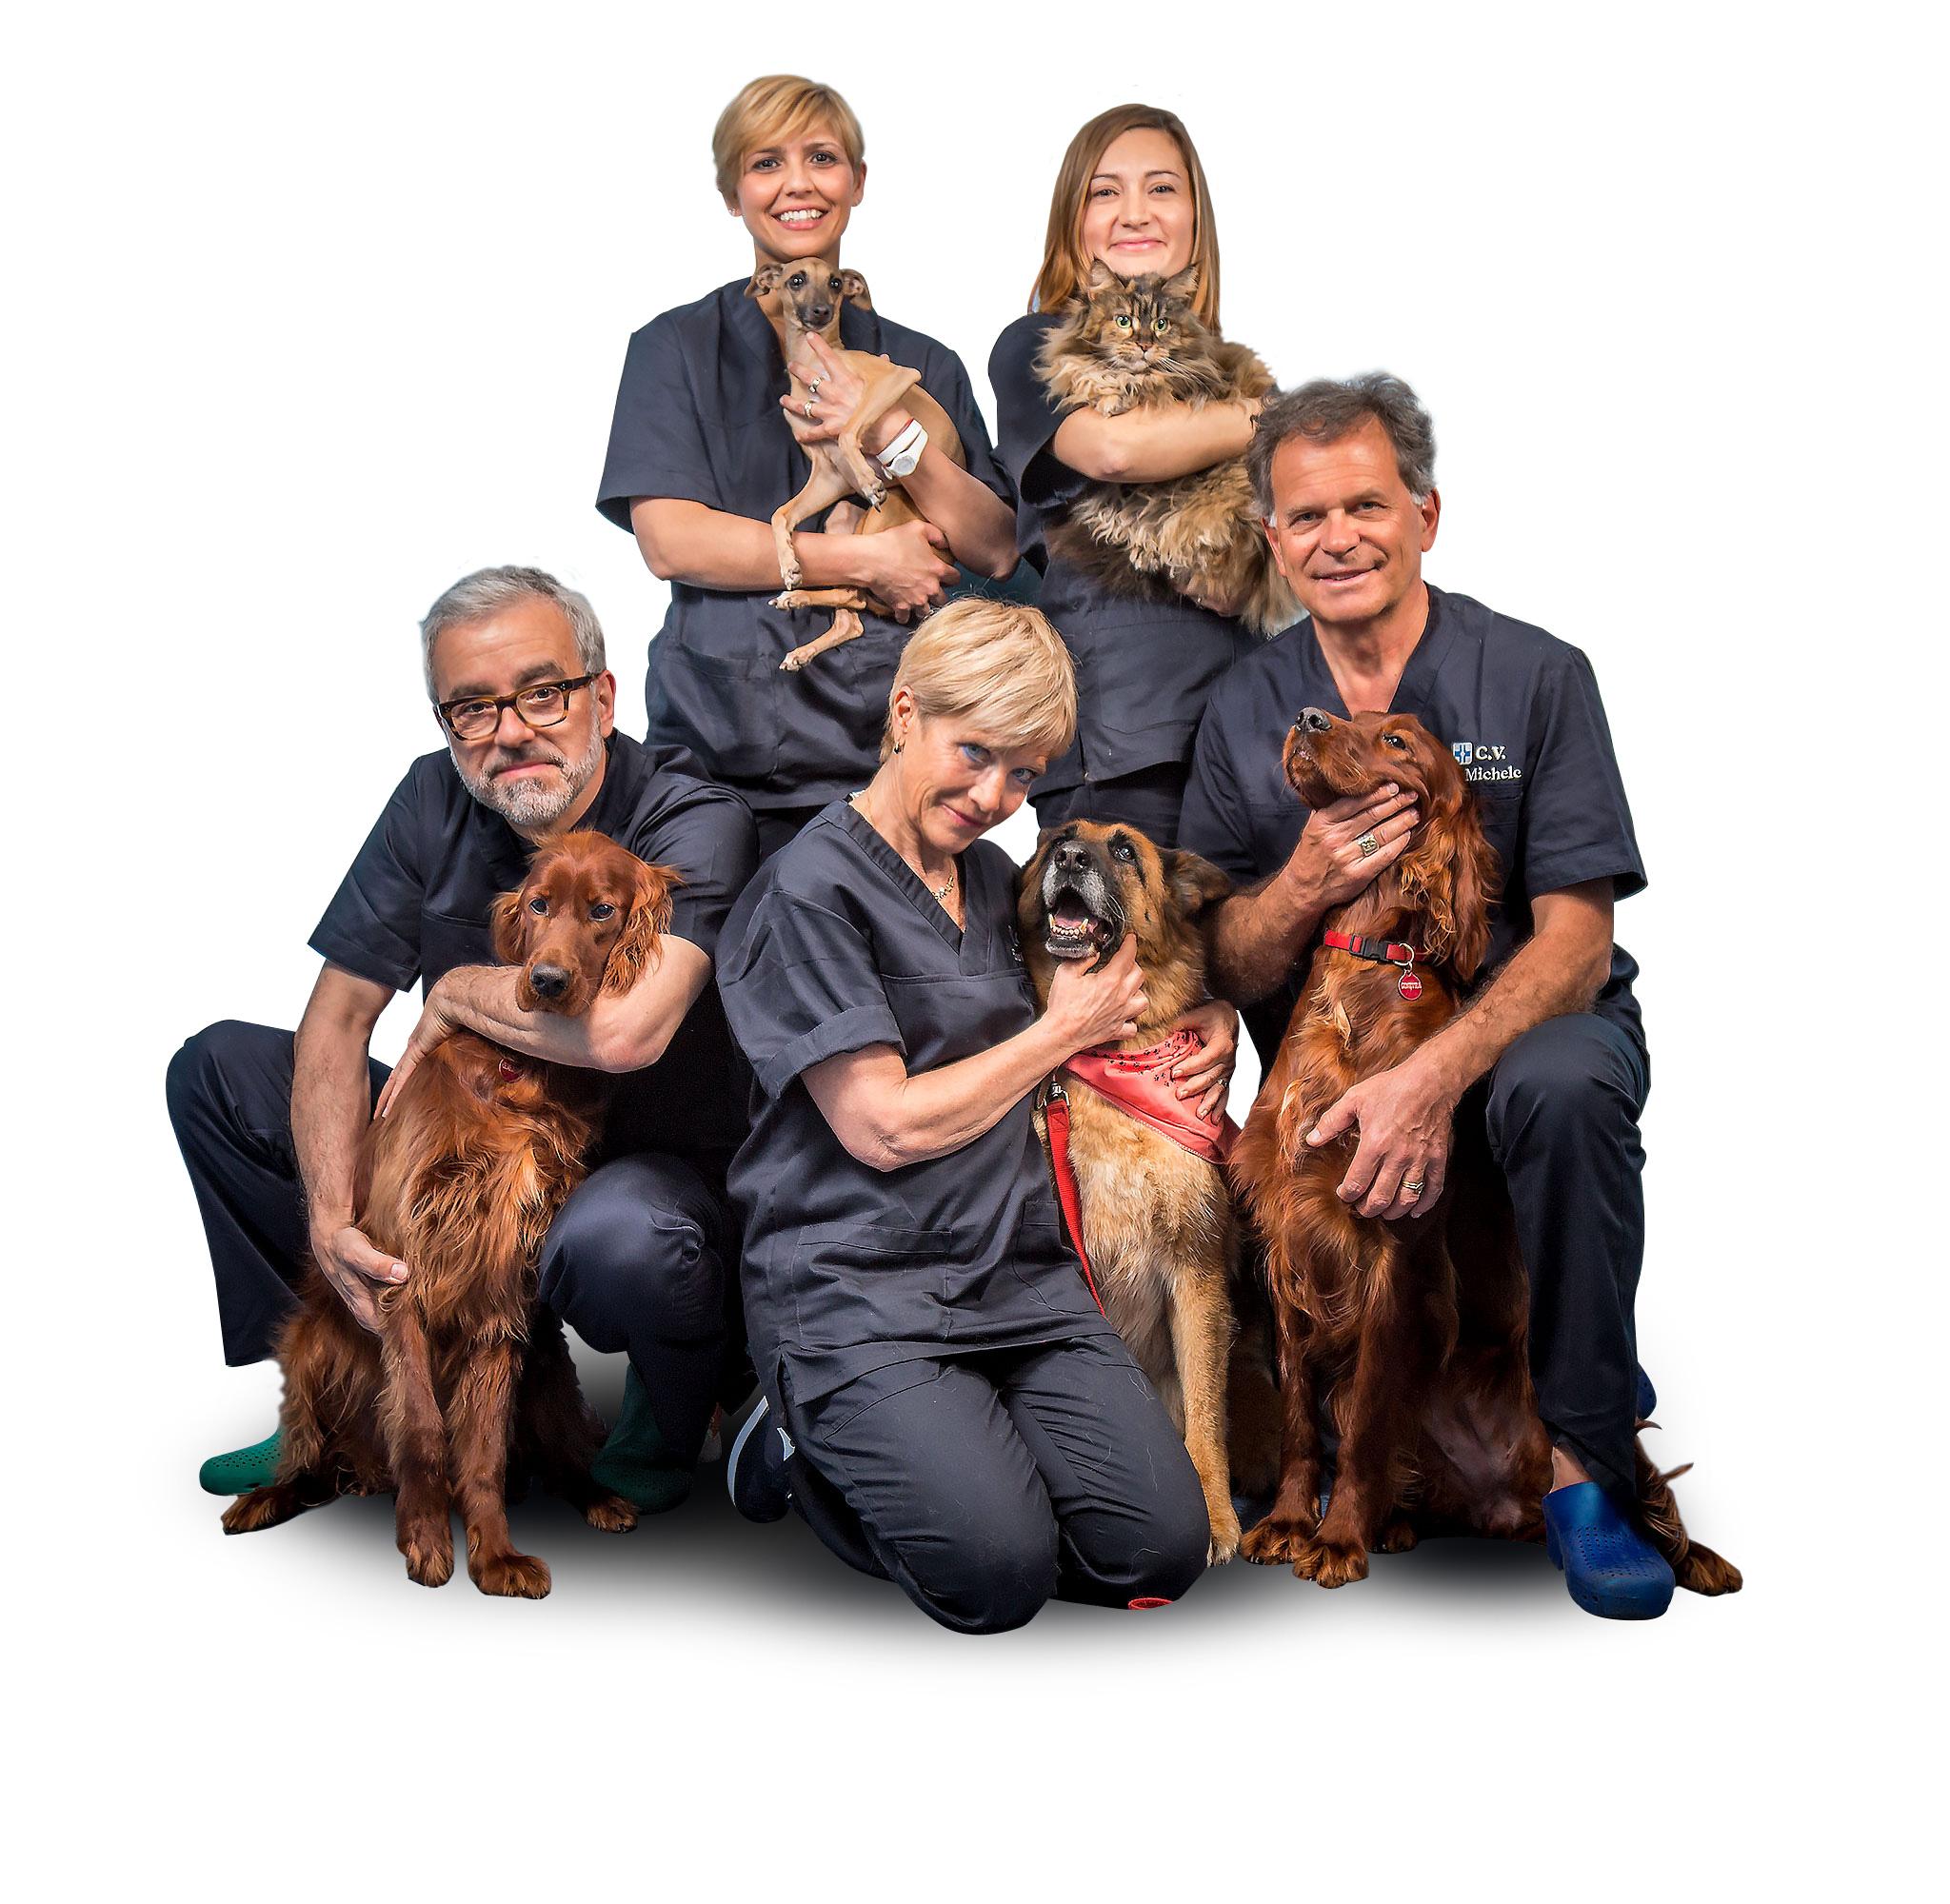 Soci veterinari Busto Arsizio